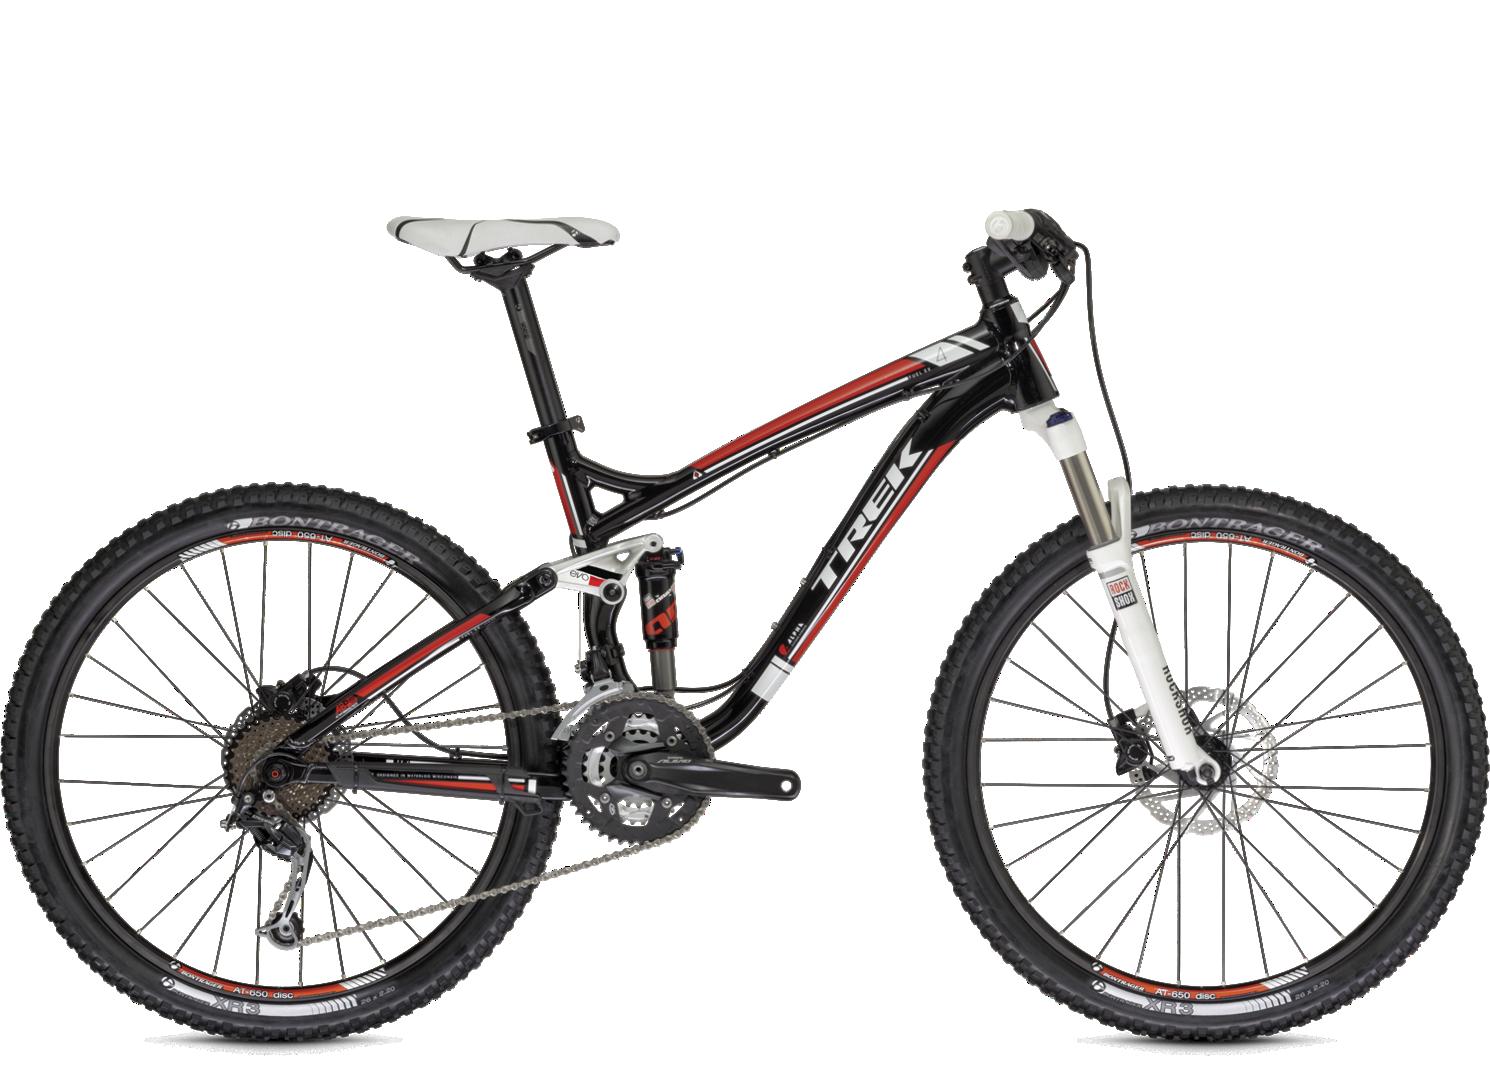 54192cc7538 2013 Fuel EX 4 - Bike Archive - Trek Bicycle